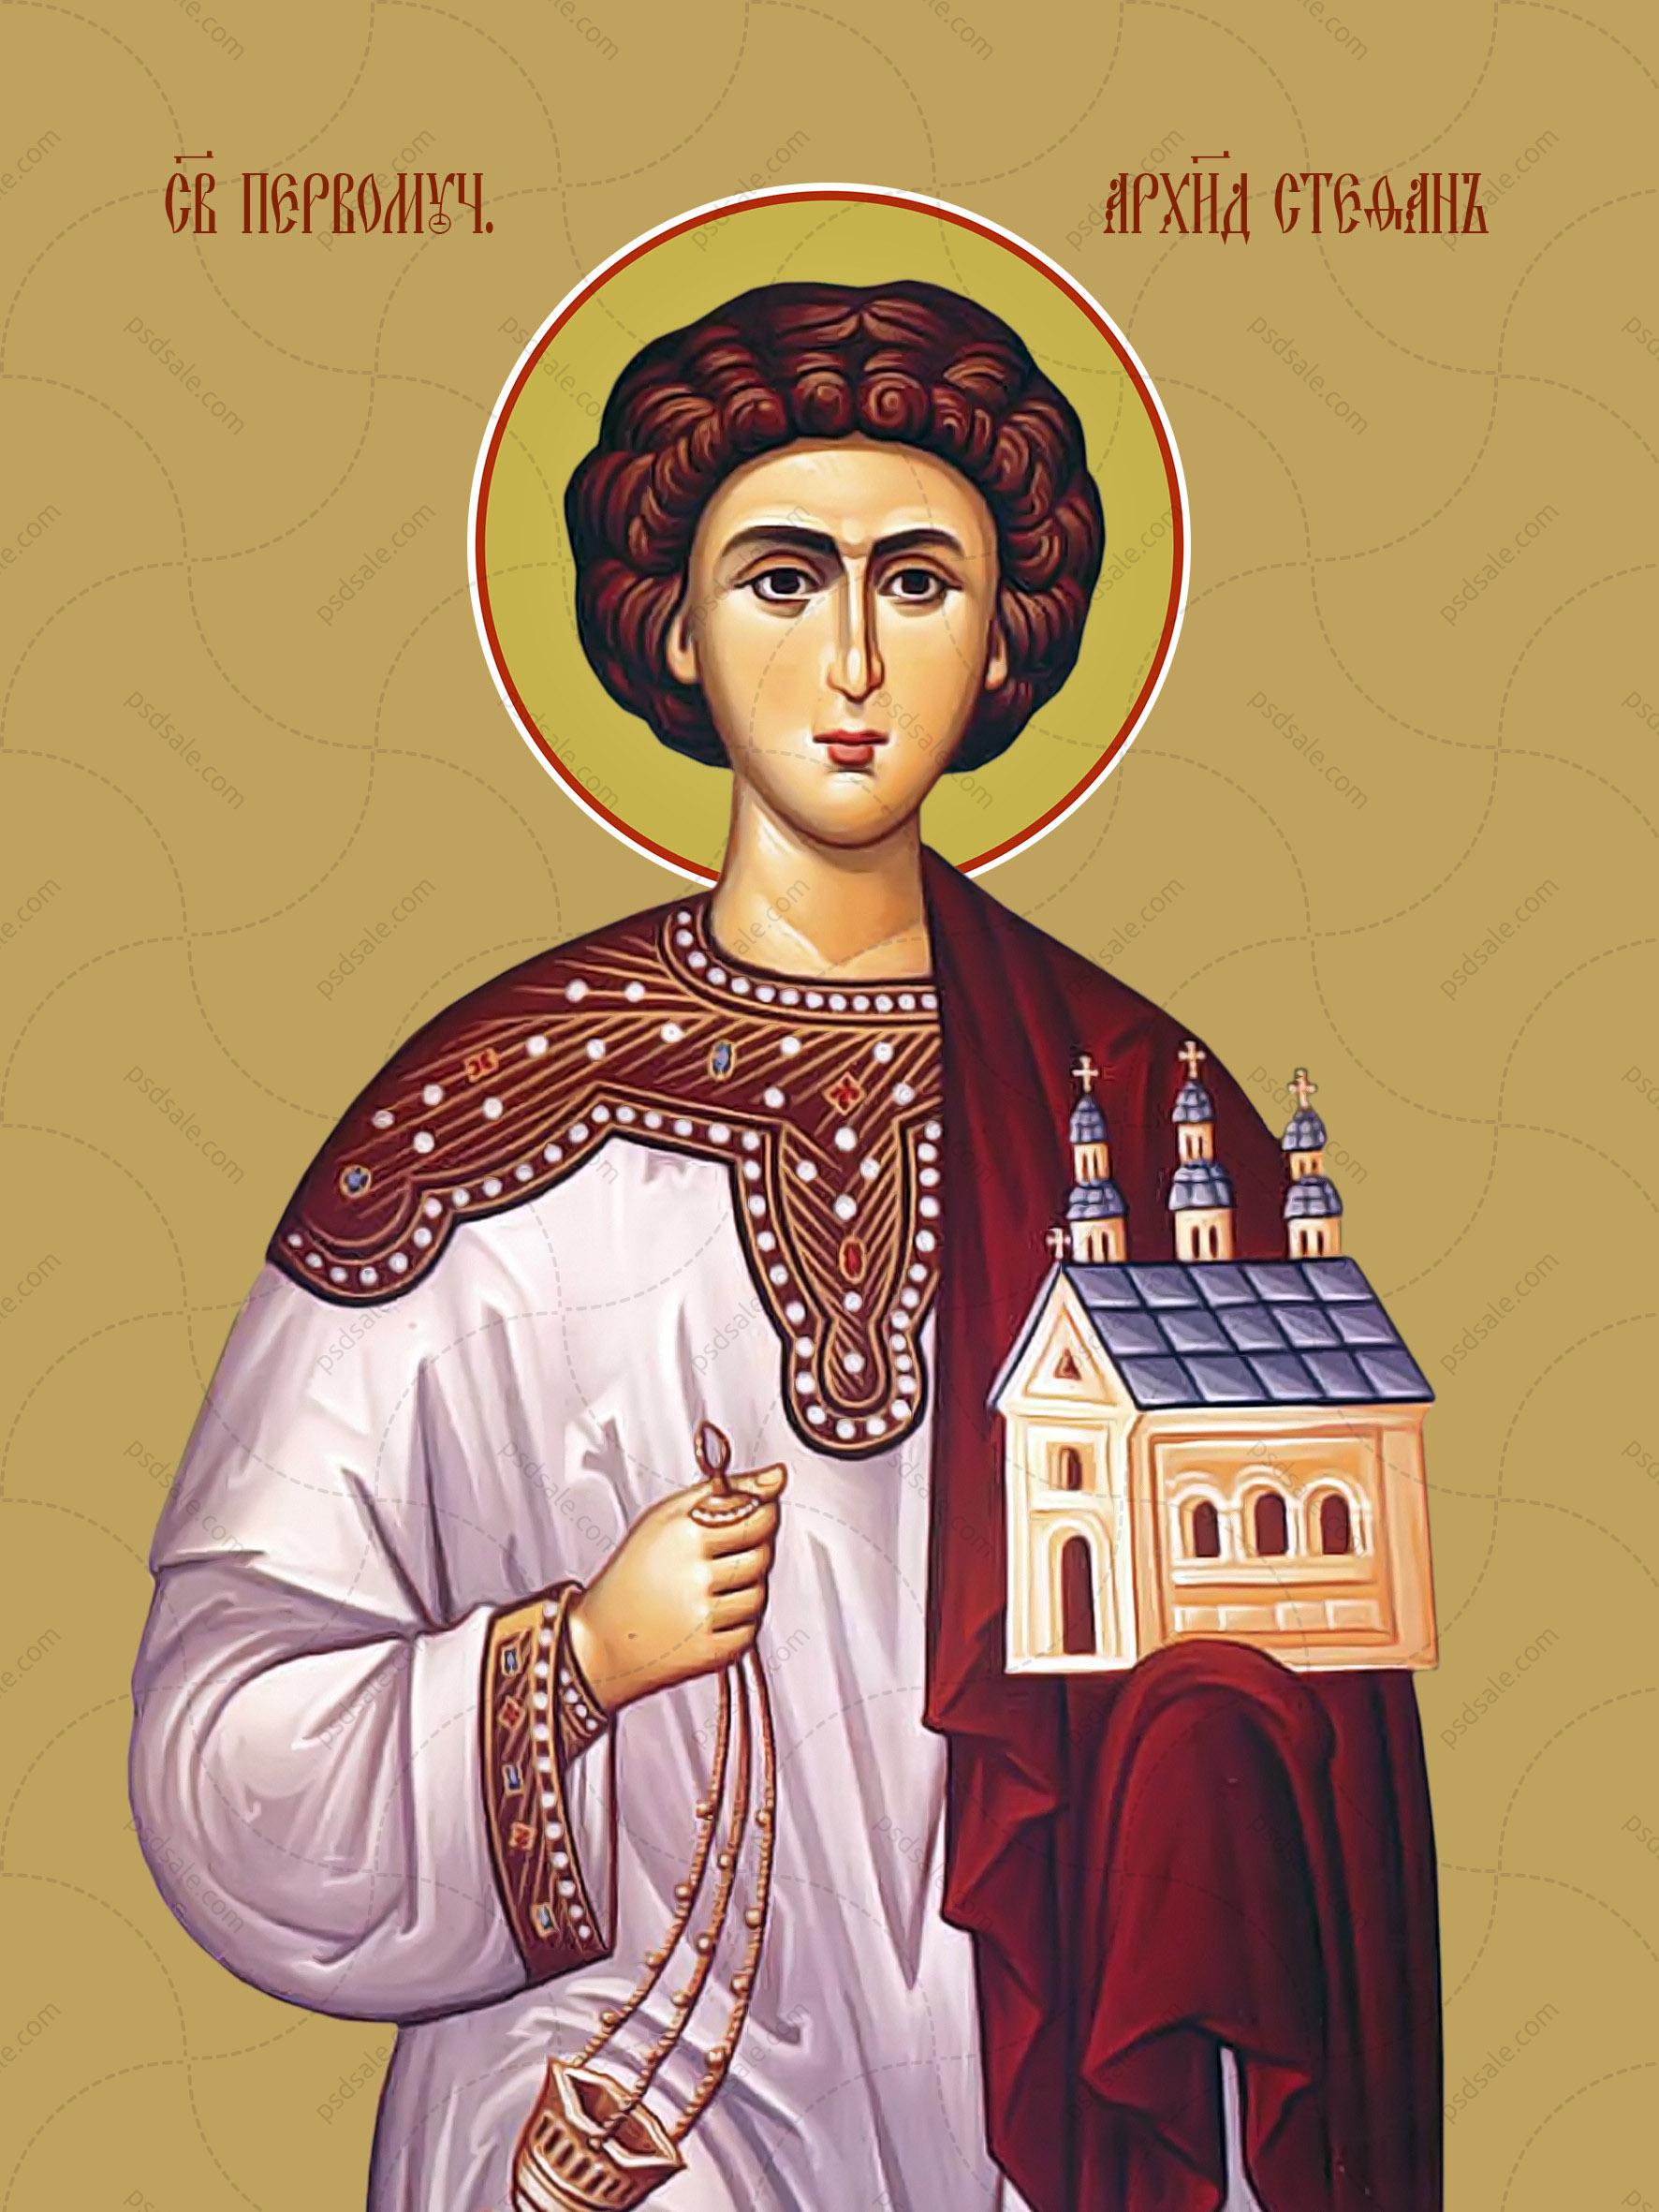 Стефан, святой архидякон